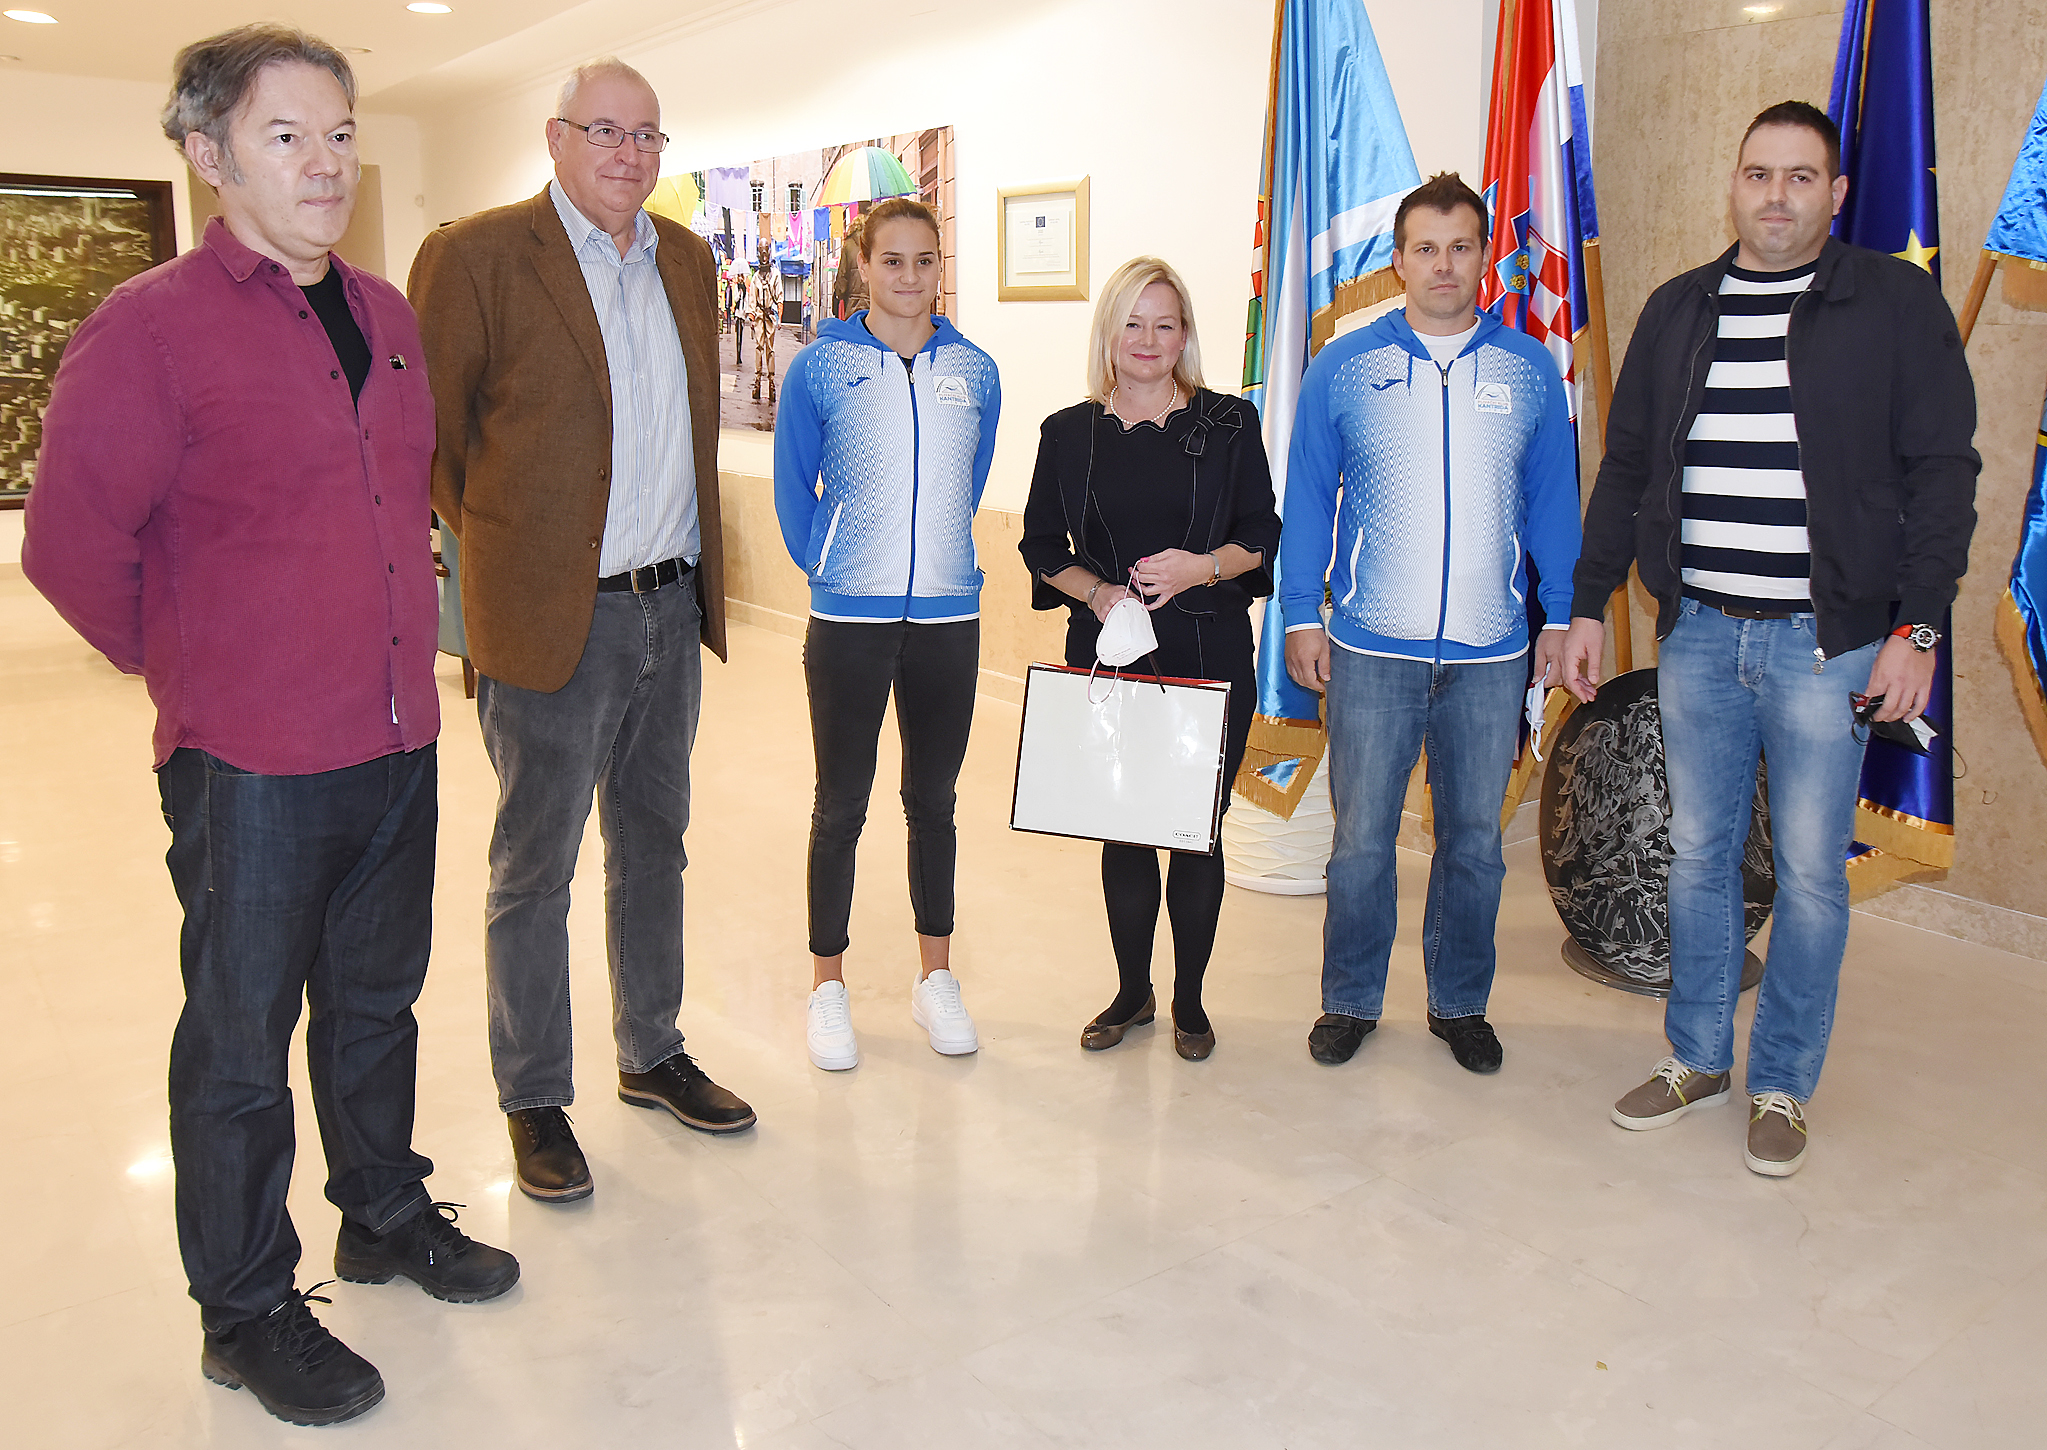 Sandro Bastiančić, Zdravko Ivanković, Meri Mataja, Sandra Krpan, Dalibor Krebelj i Filip Gajski/Foto S. DRECHSLER